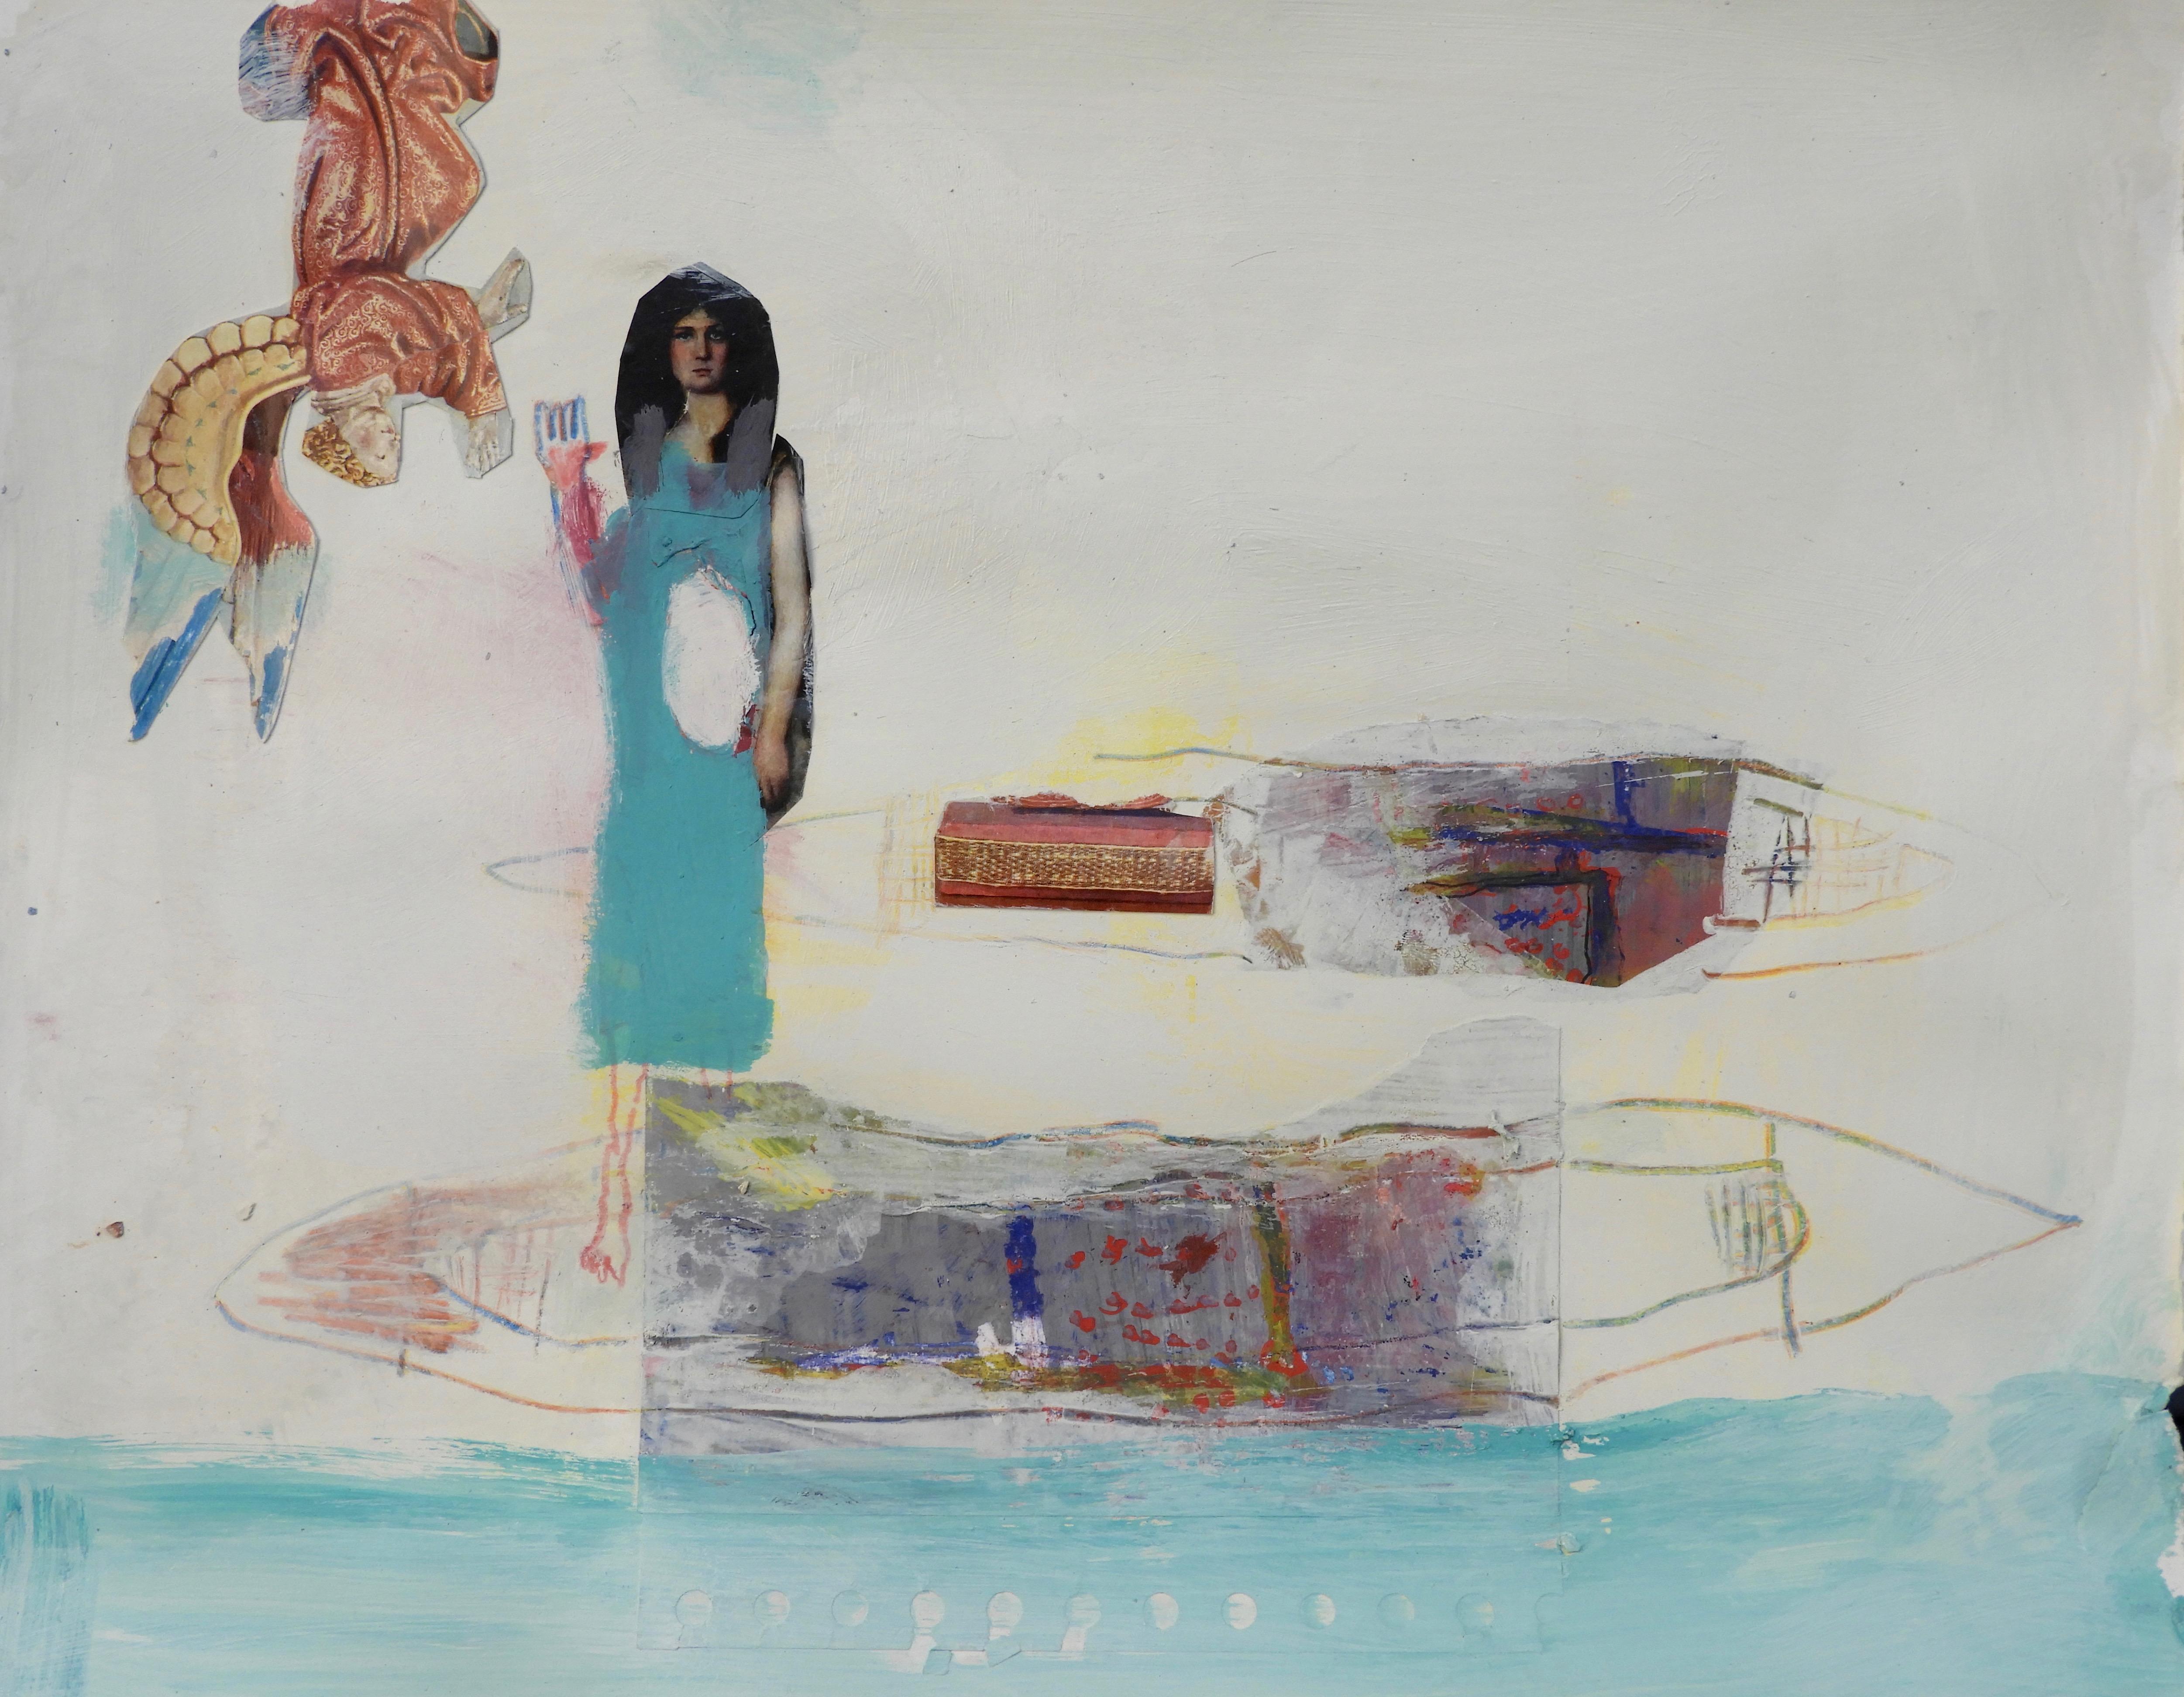 Ange, femme et barque